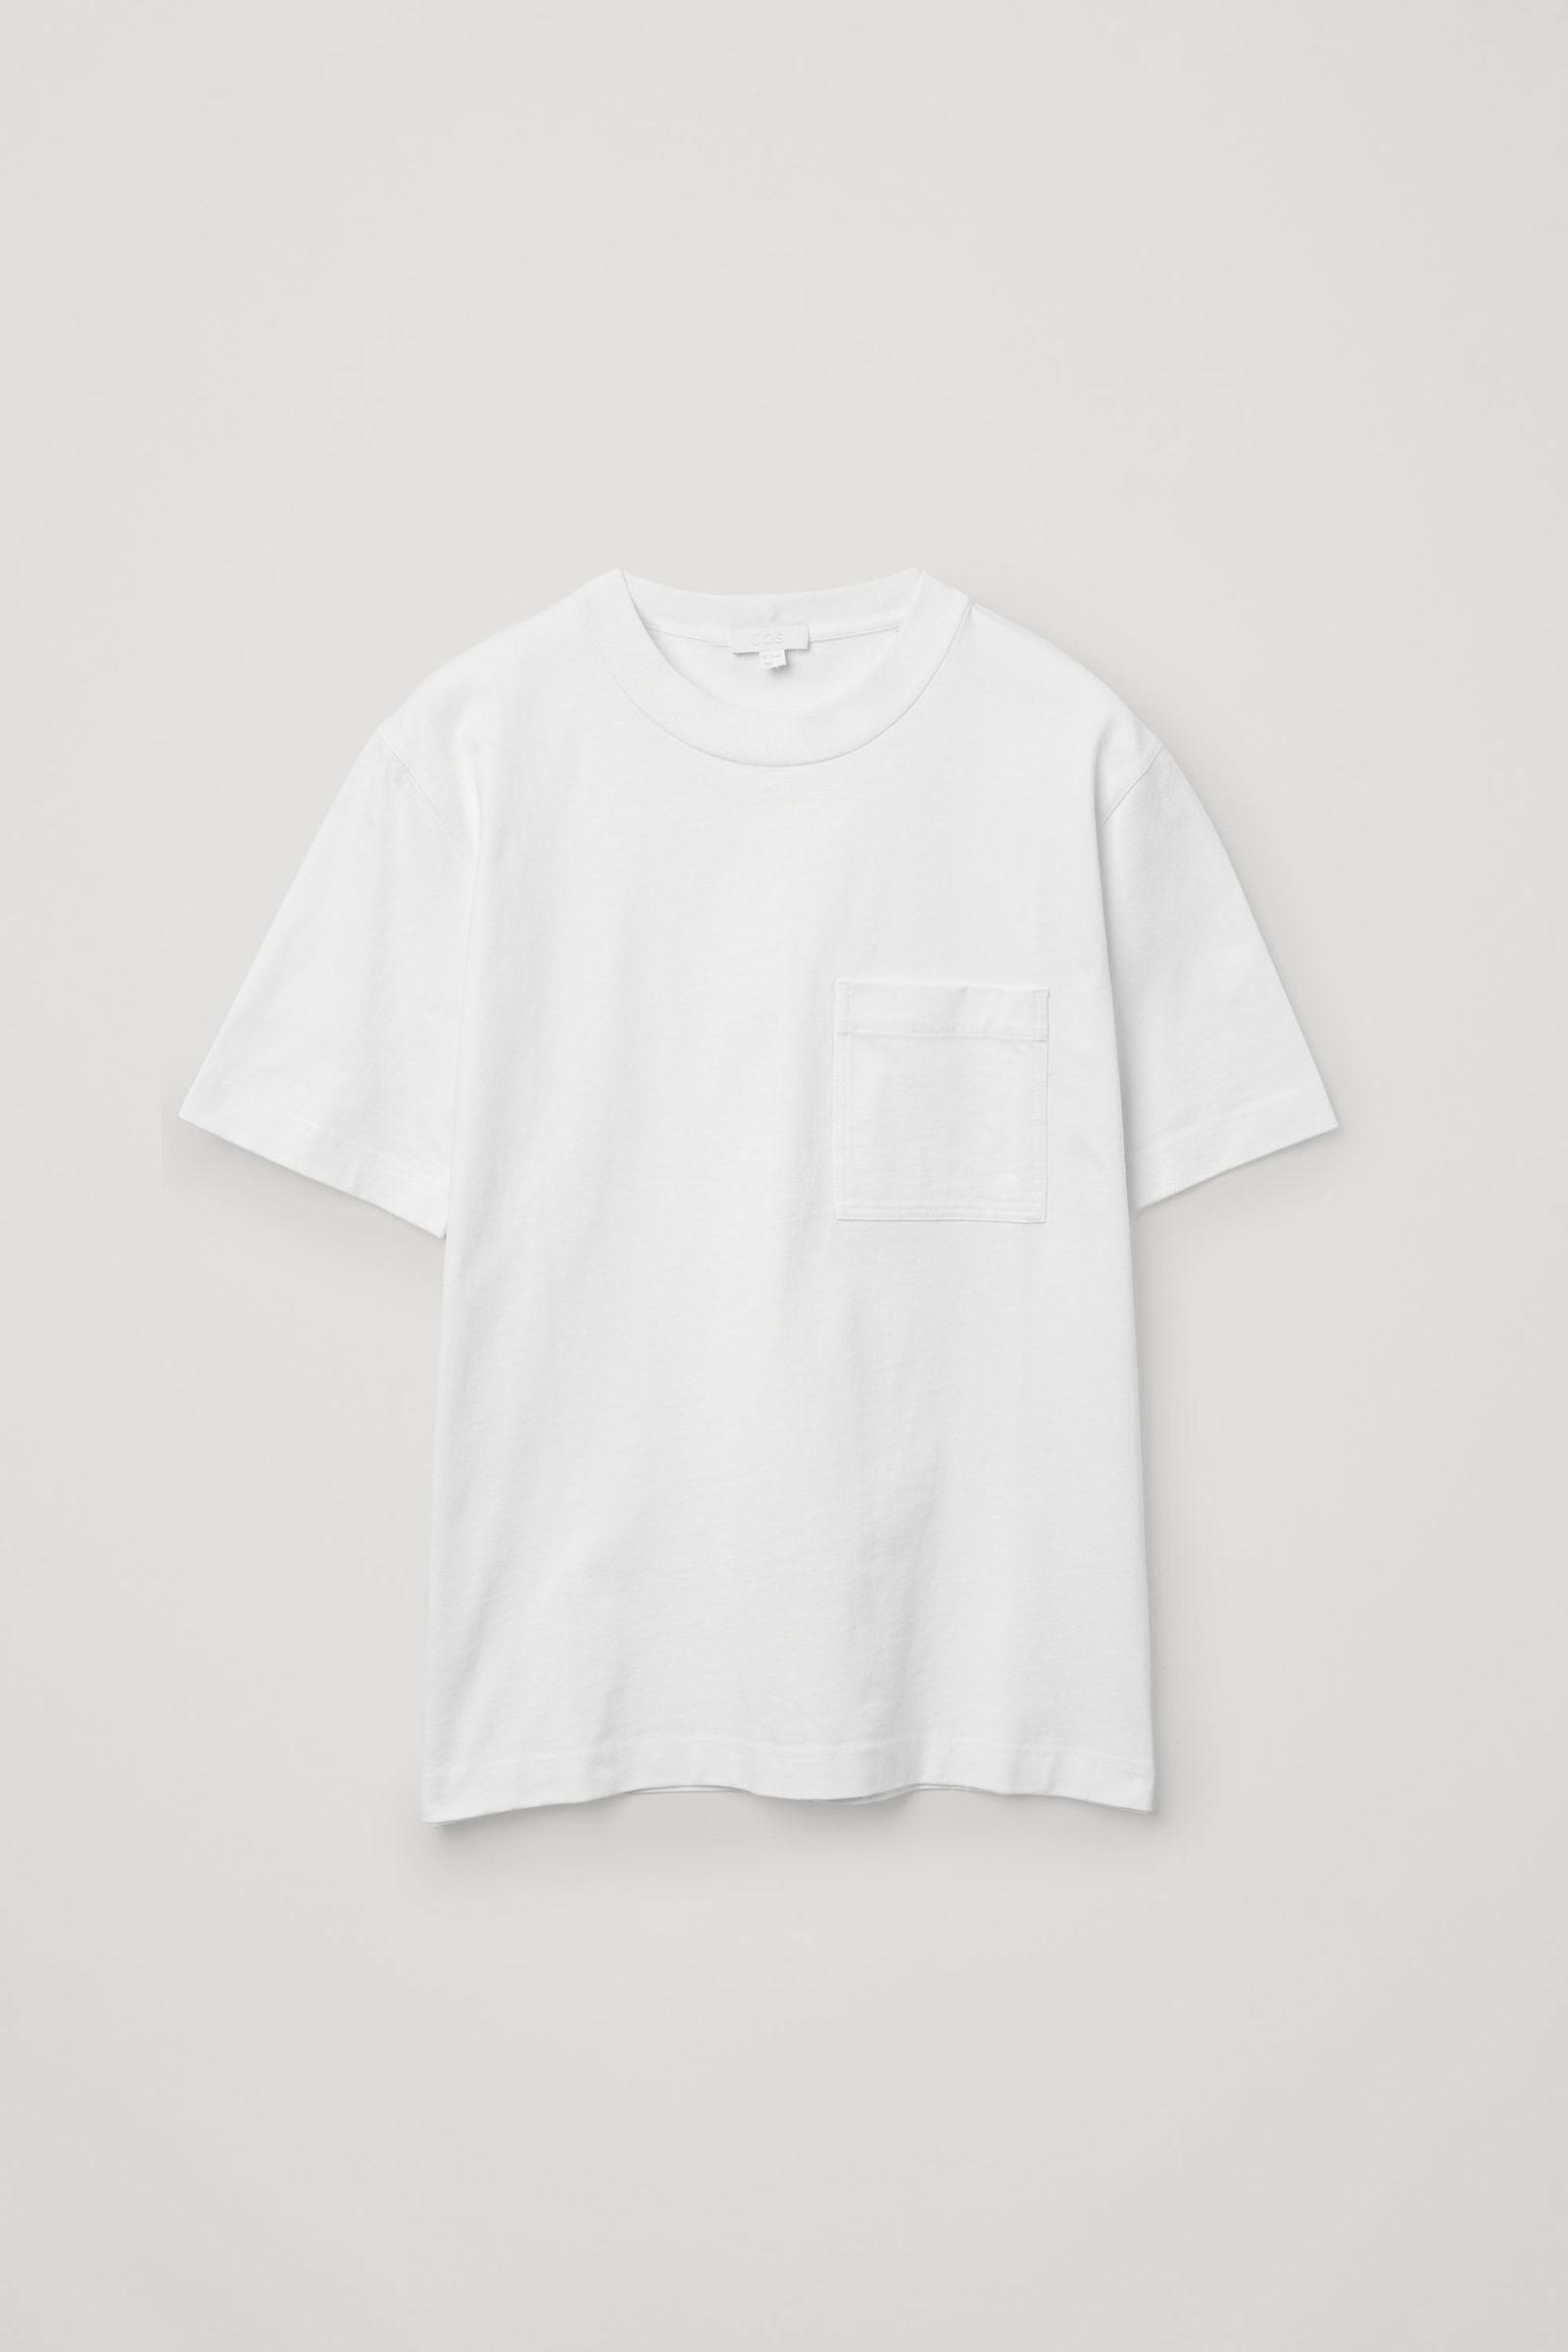 COS 오가닉 코튼 패치 포켓 티셔츠의 화이트컬러 Product입니다.